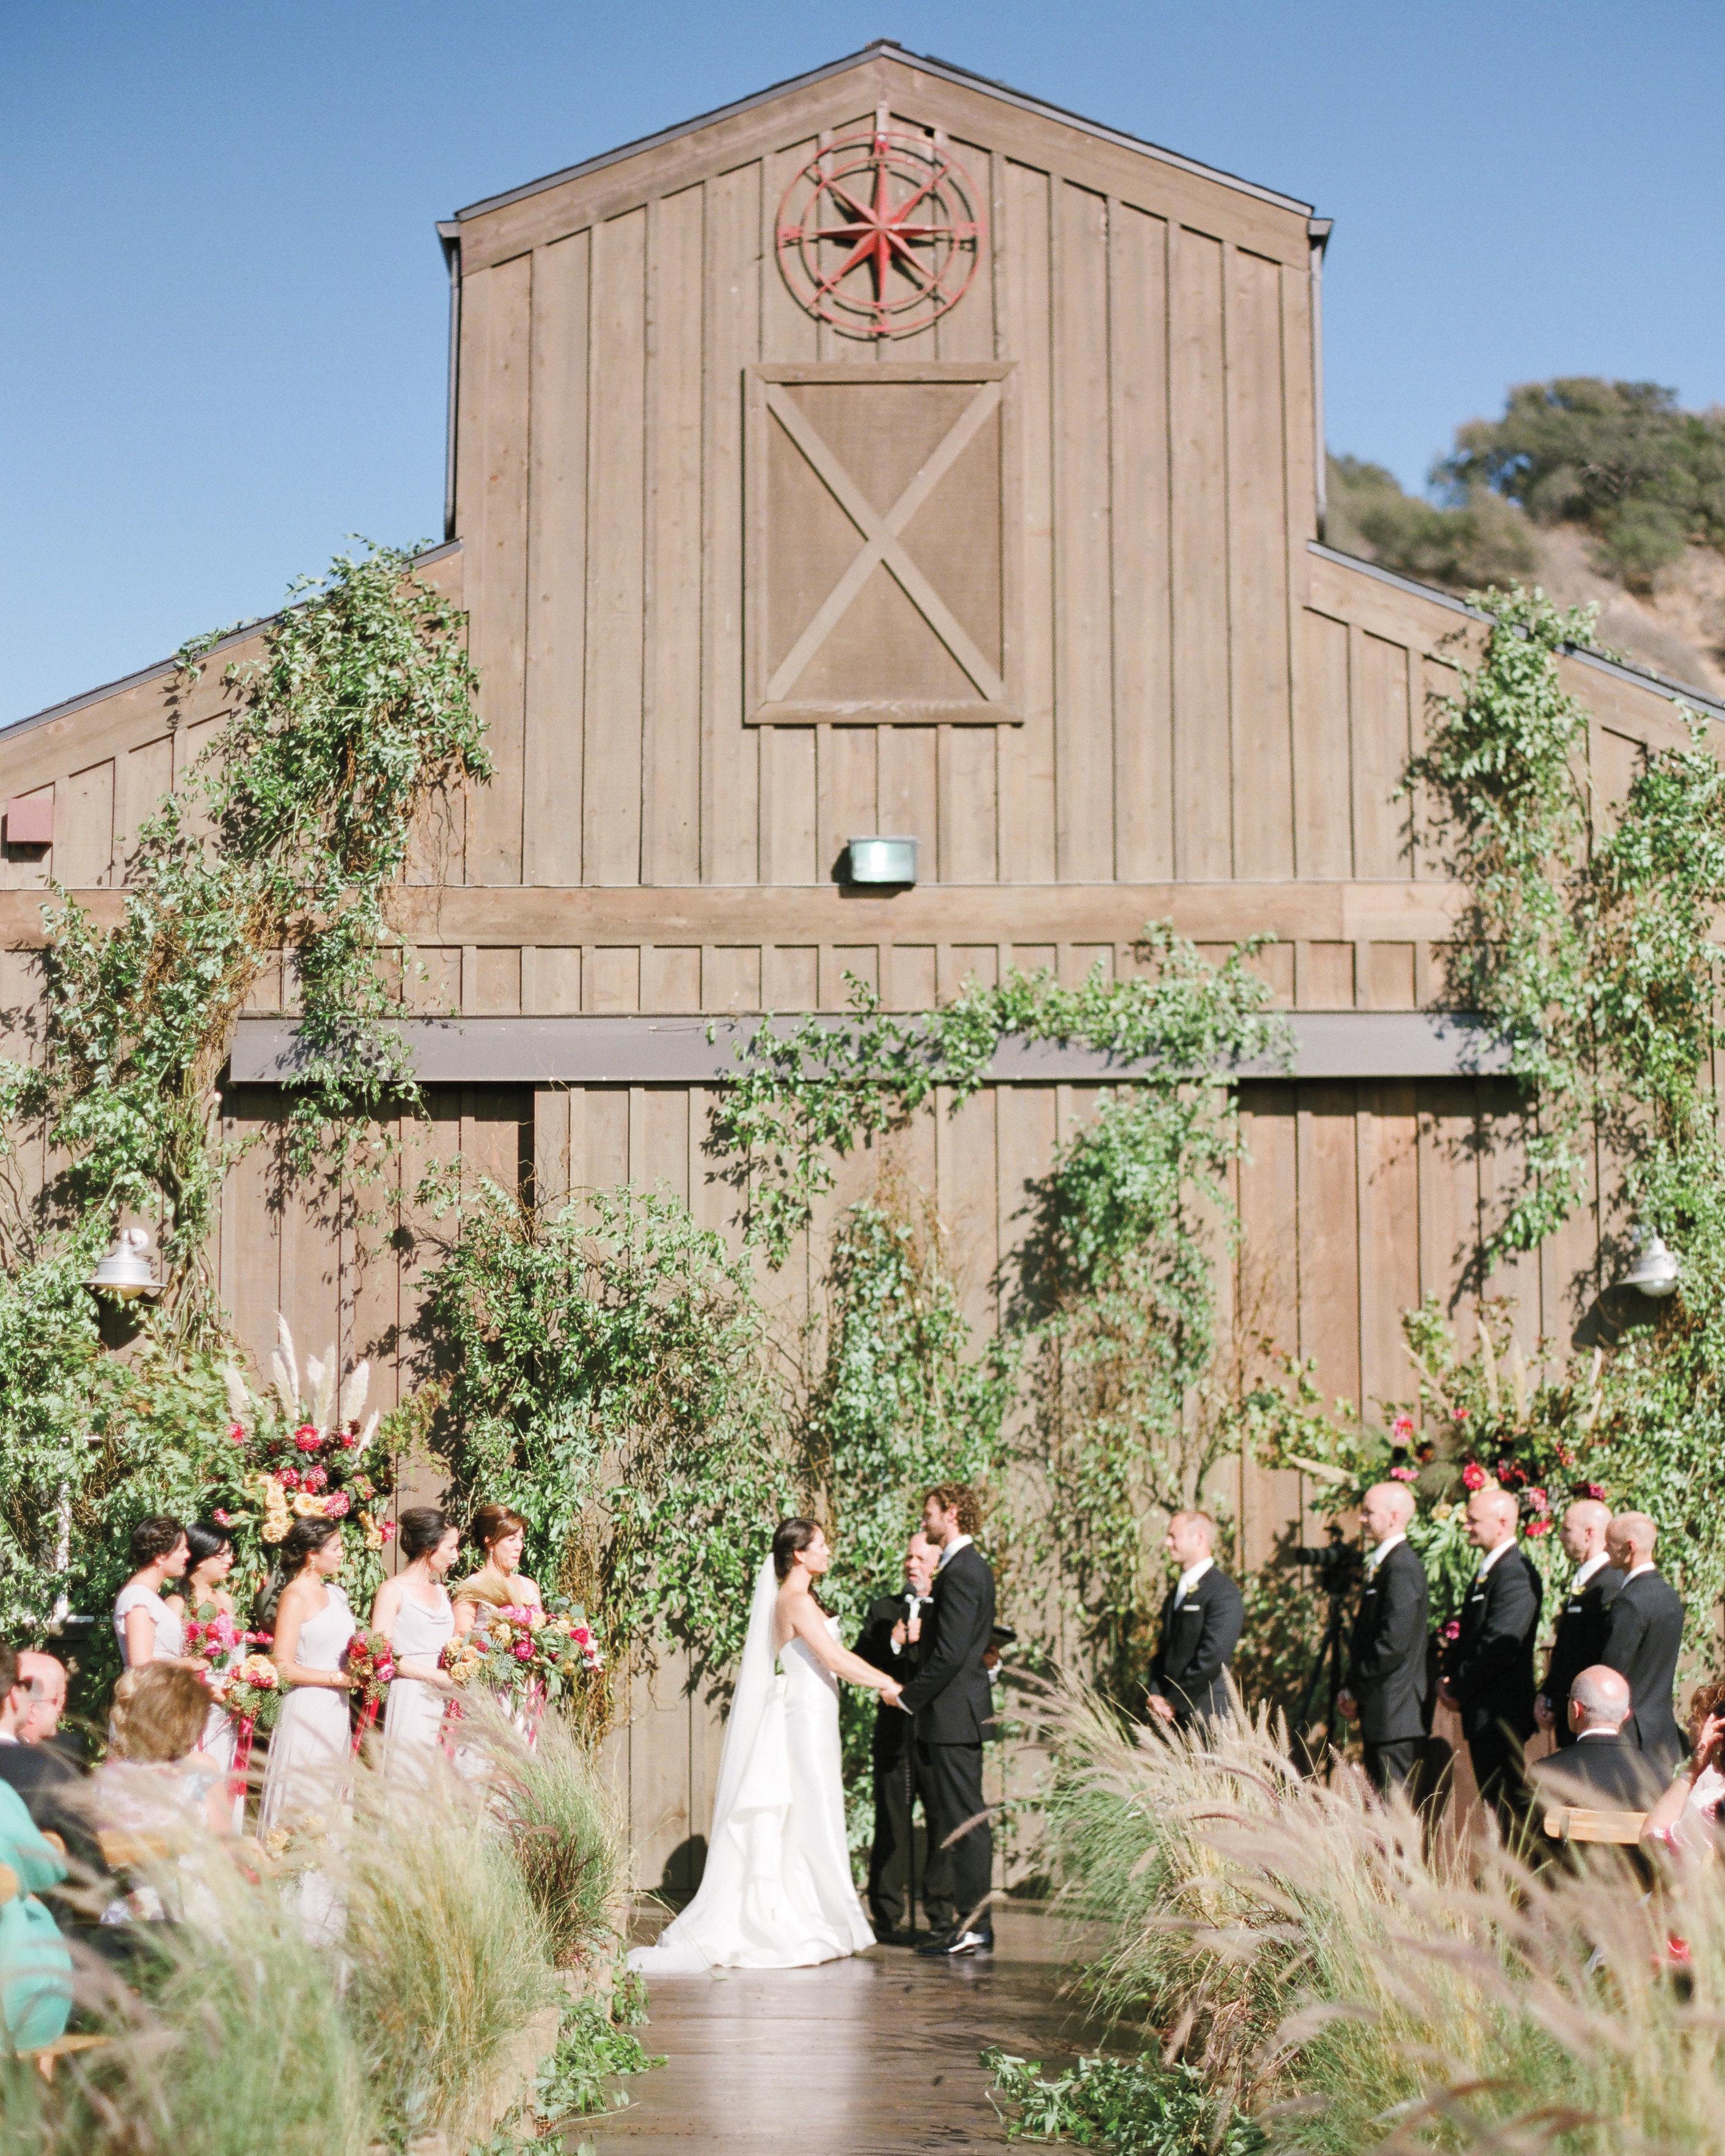 corrine-patrick-wedding-santa-ynez-44520001-s110842.jpg